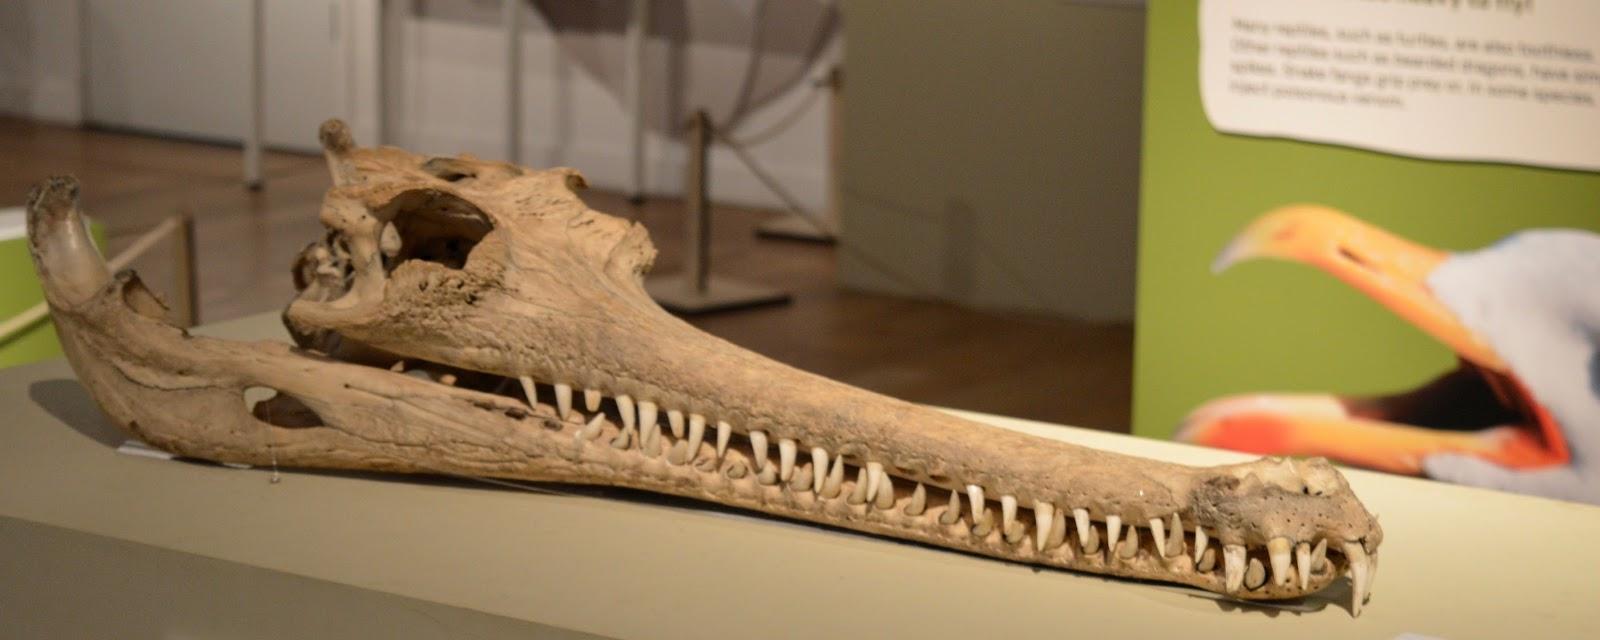 Bones Exhibition at Hancock Museum, Newcastle - crocodile skull